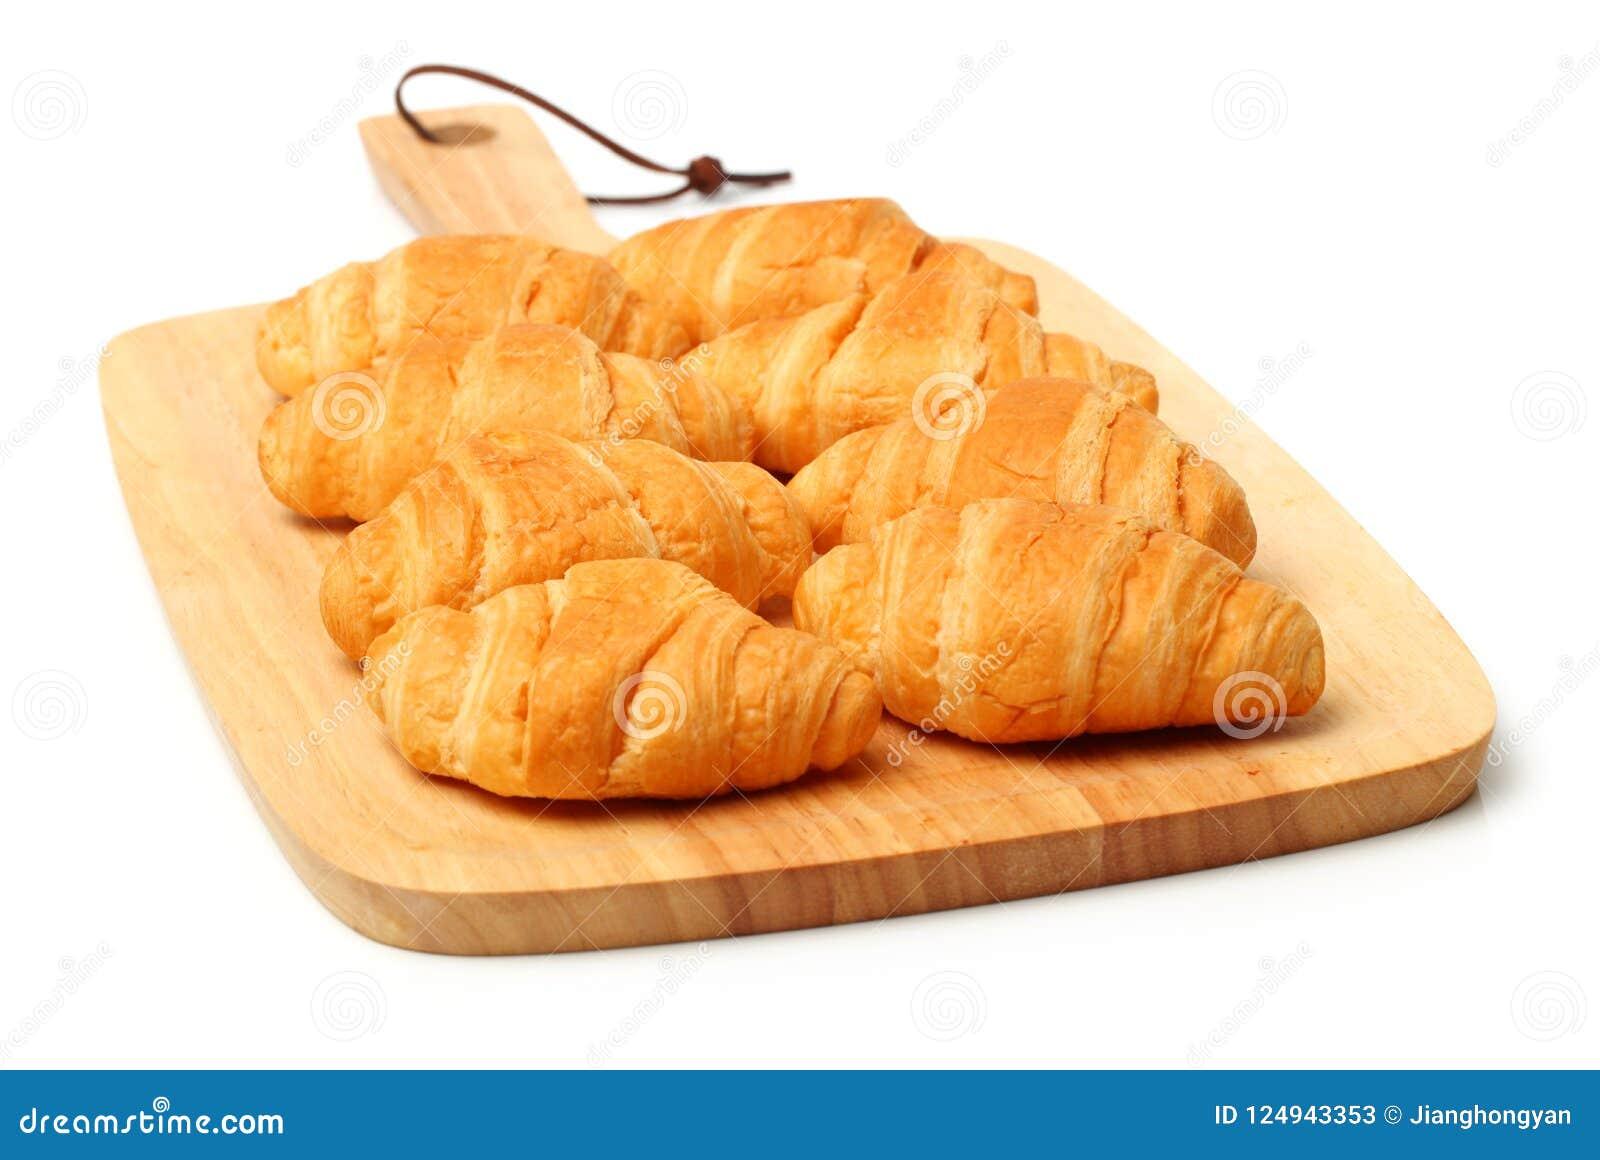 Cima del croissant